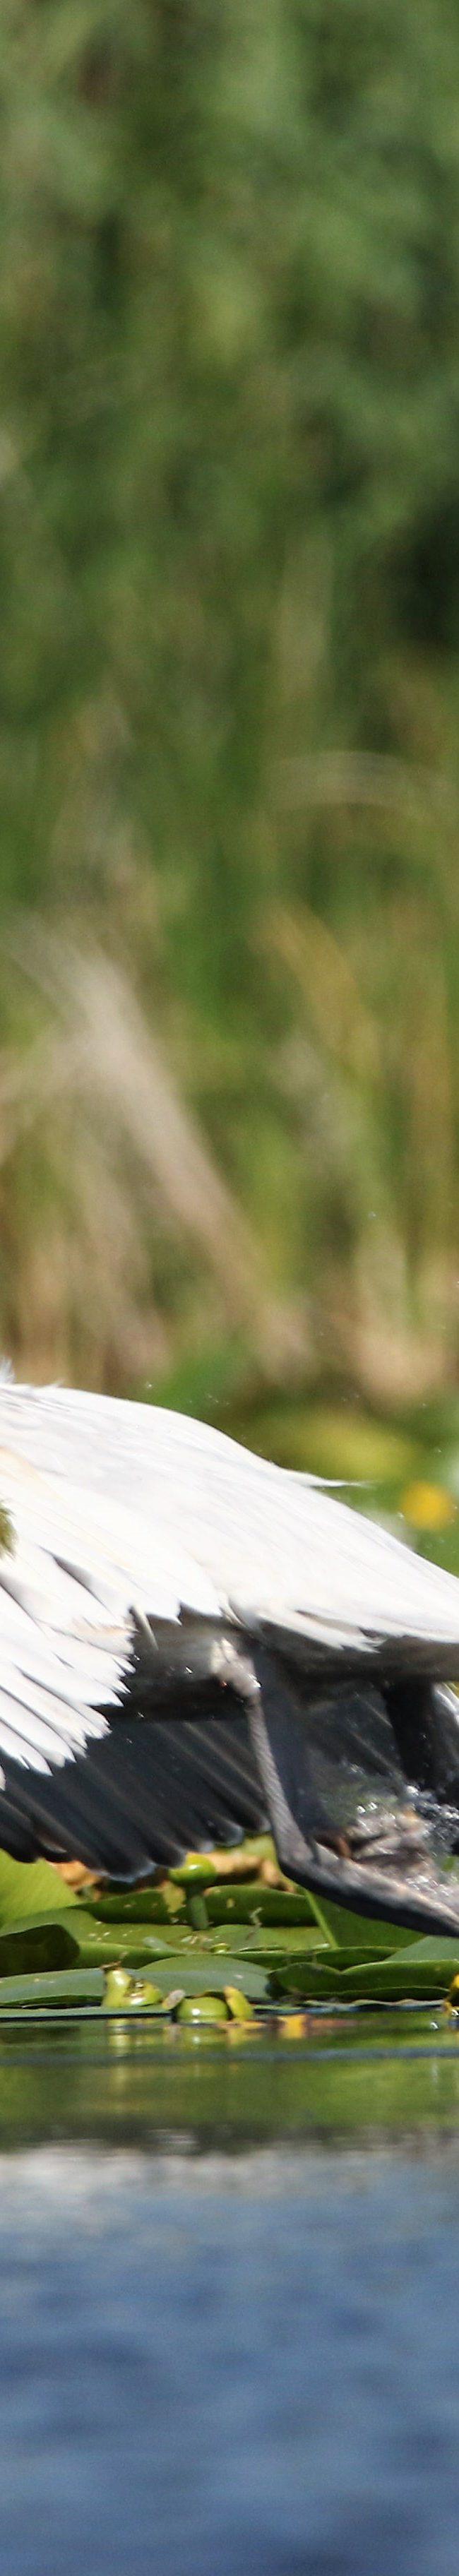 Kroeskop pelikaan (pelecanus crispus)